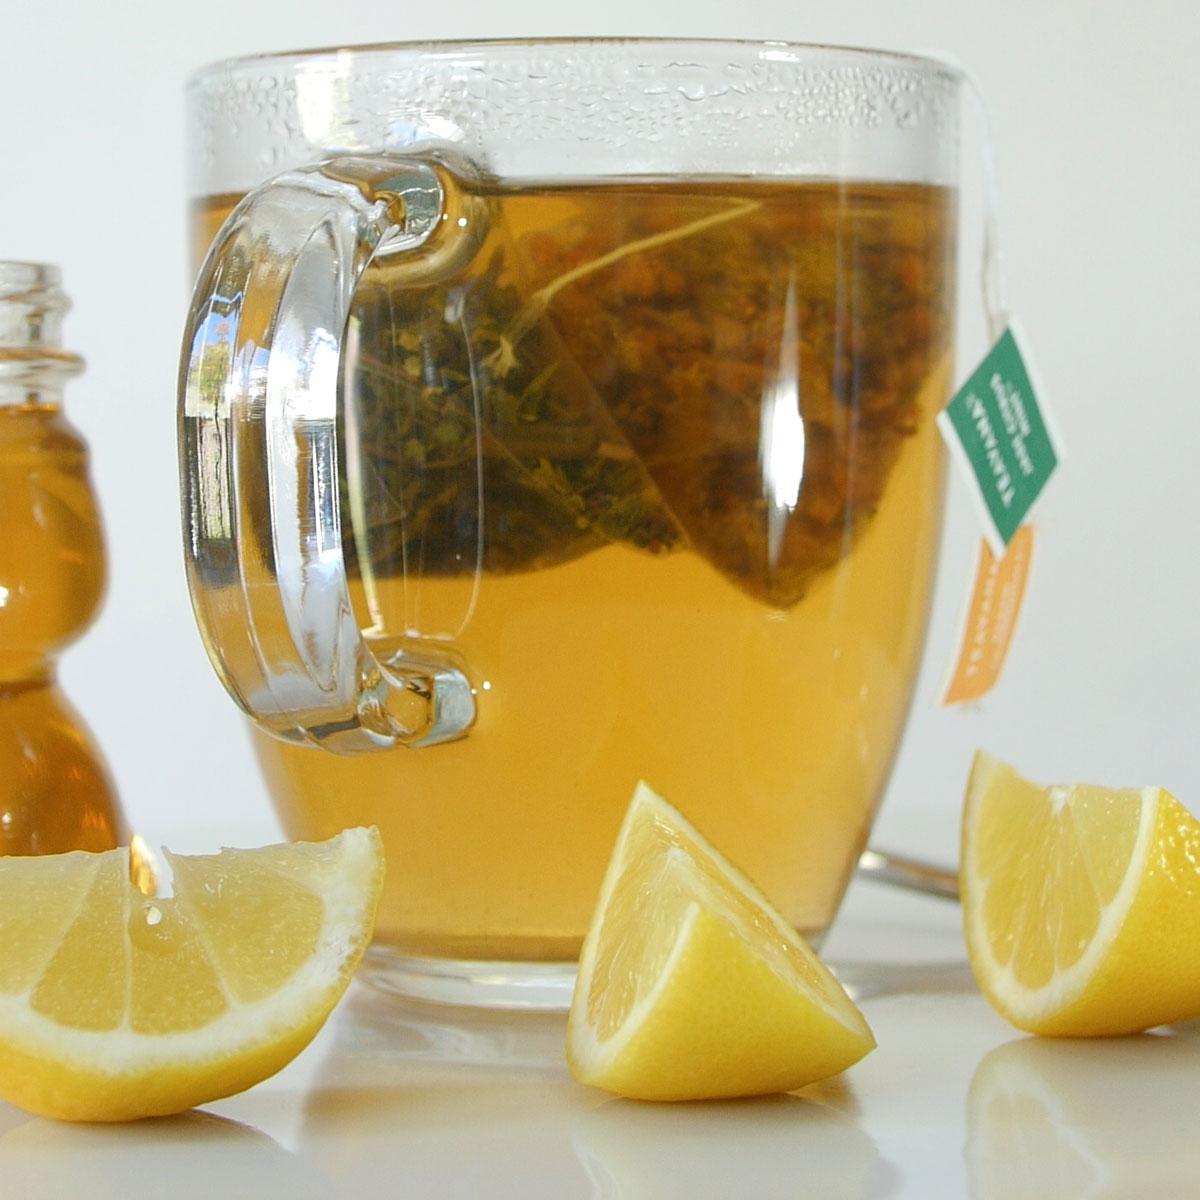 glass mug of tea next to sliced lemons and small honey bear jar.